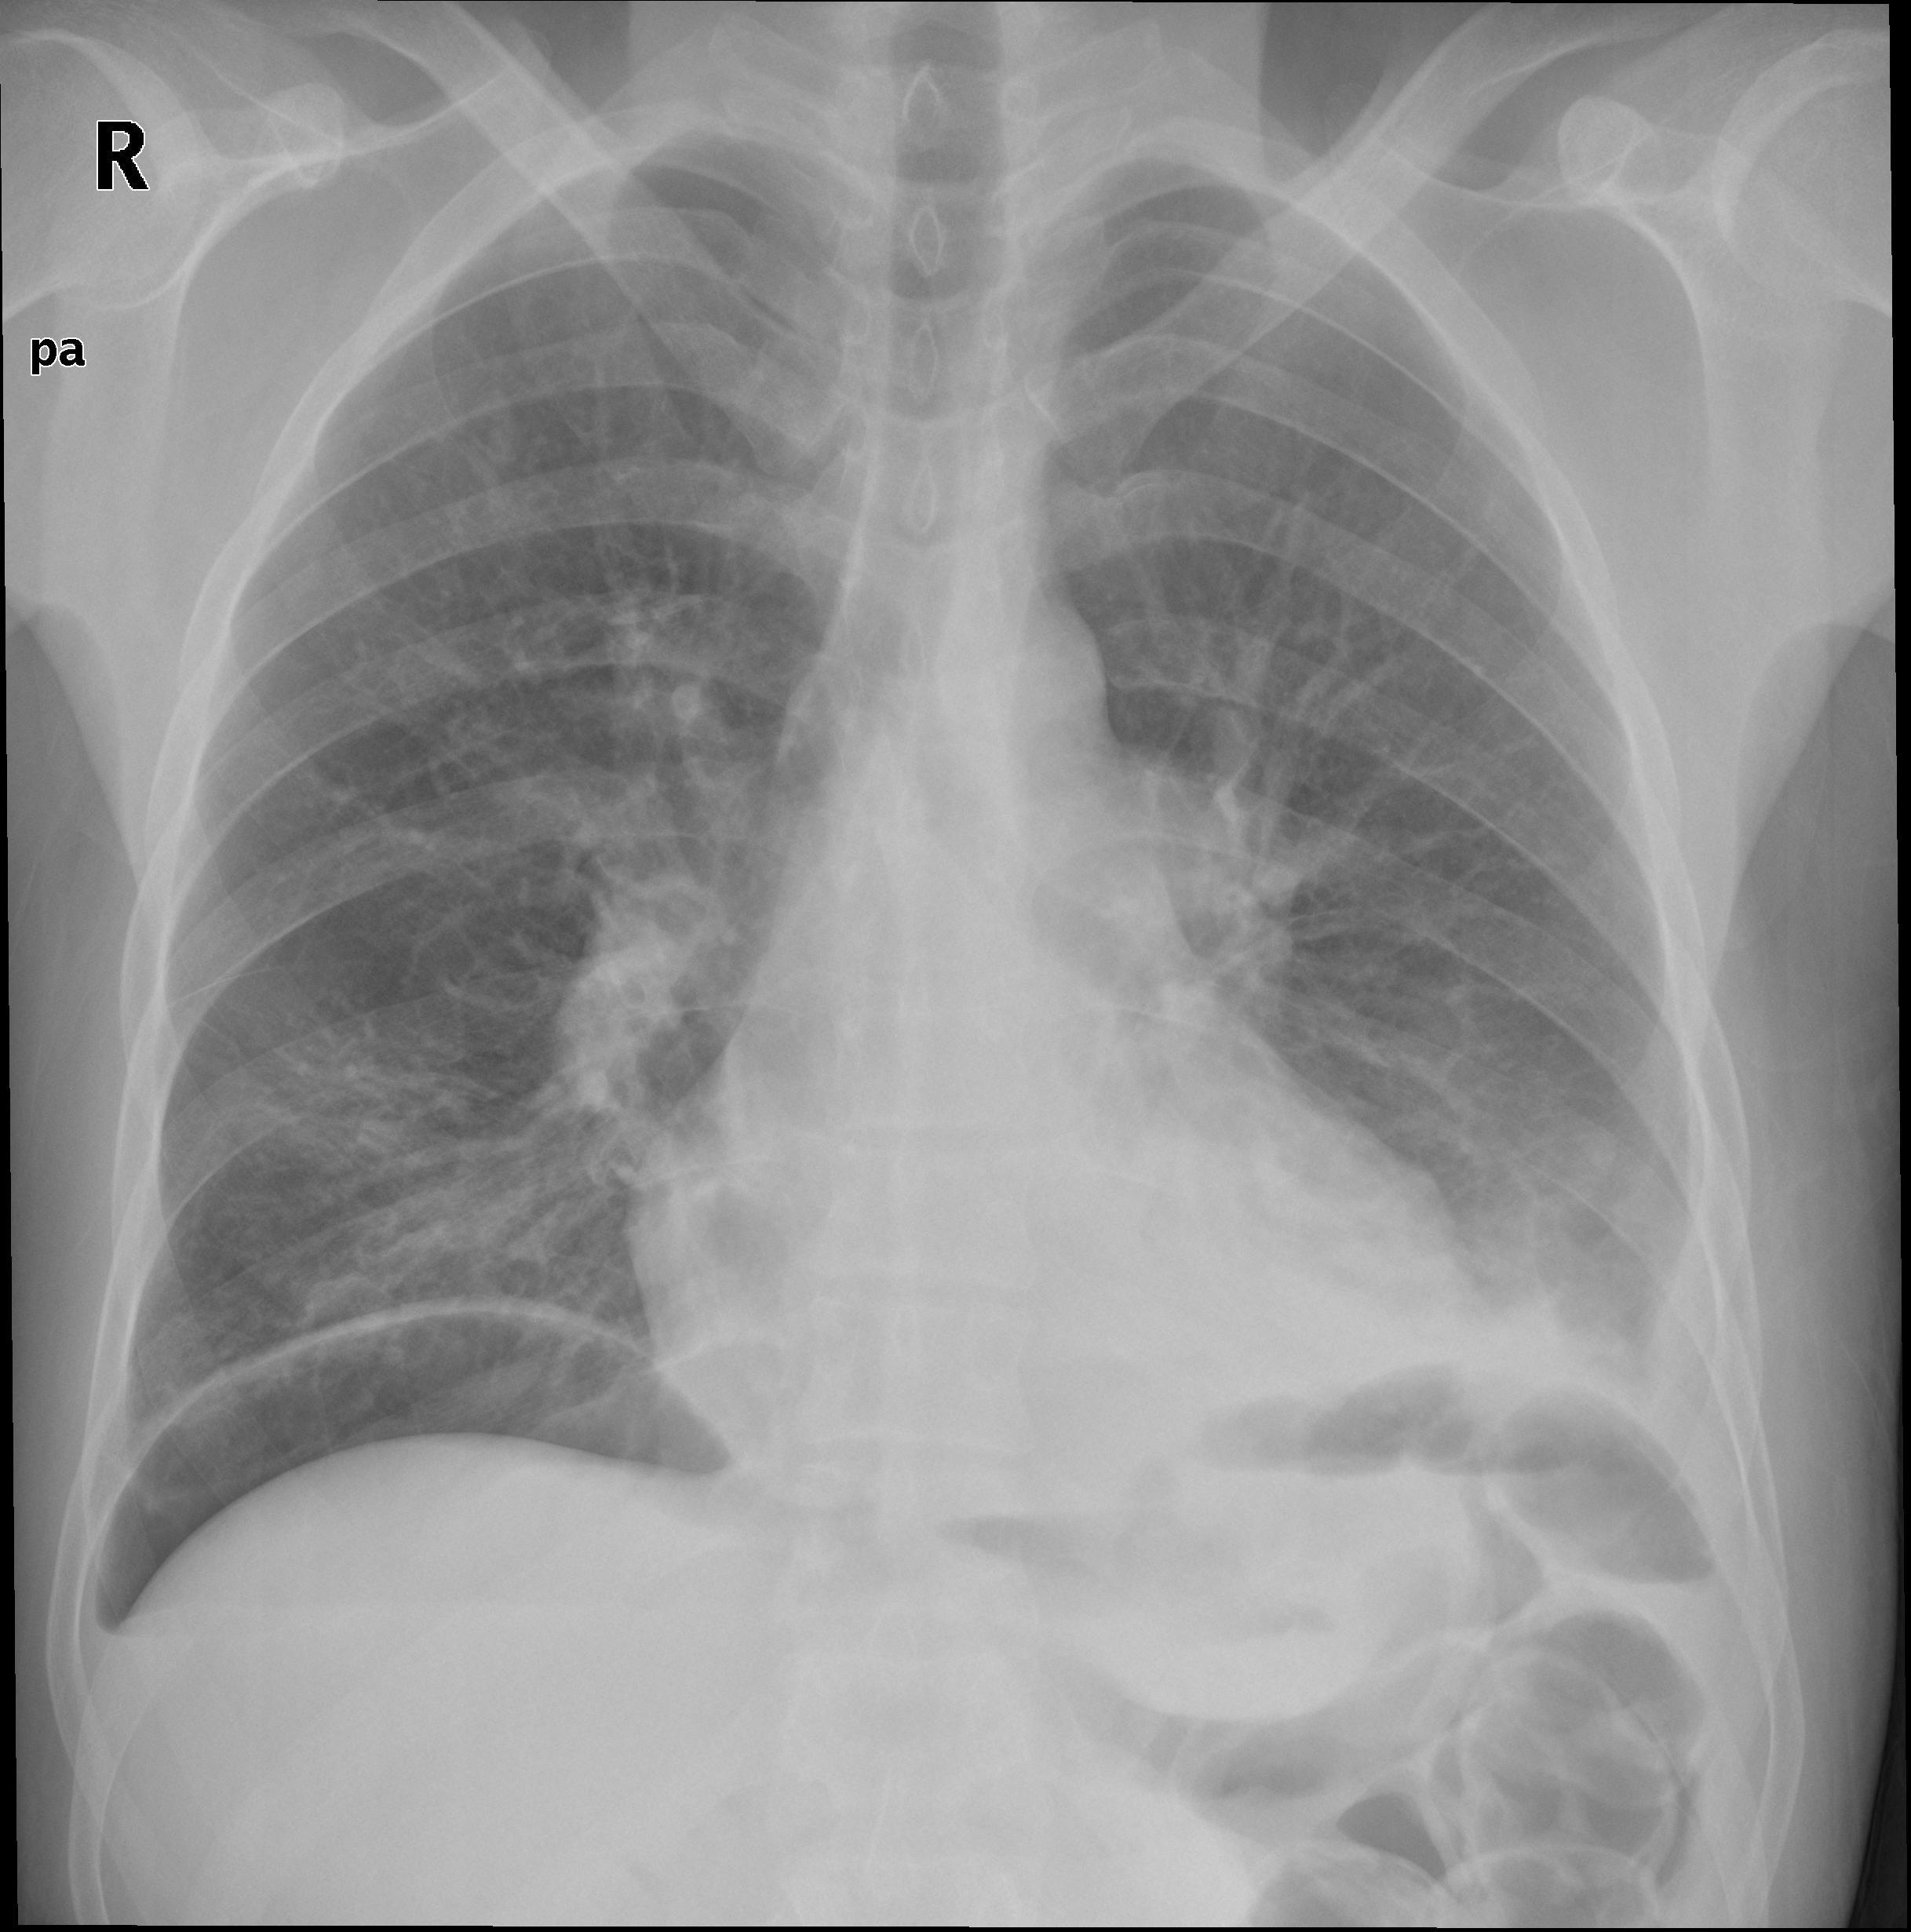 Pneumoperitonium X-ray